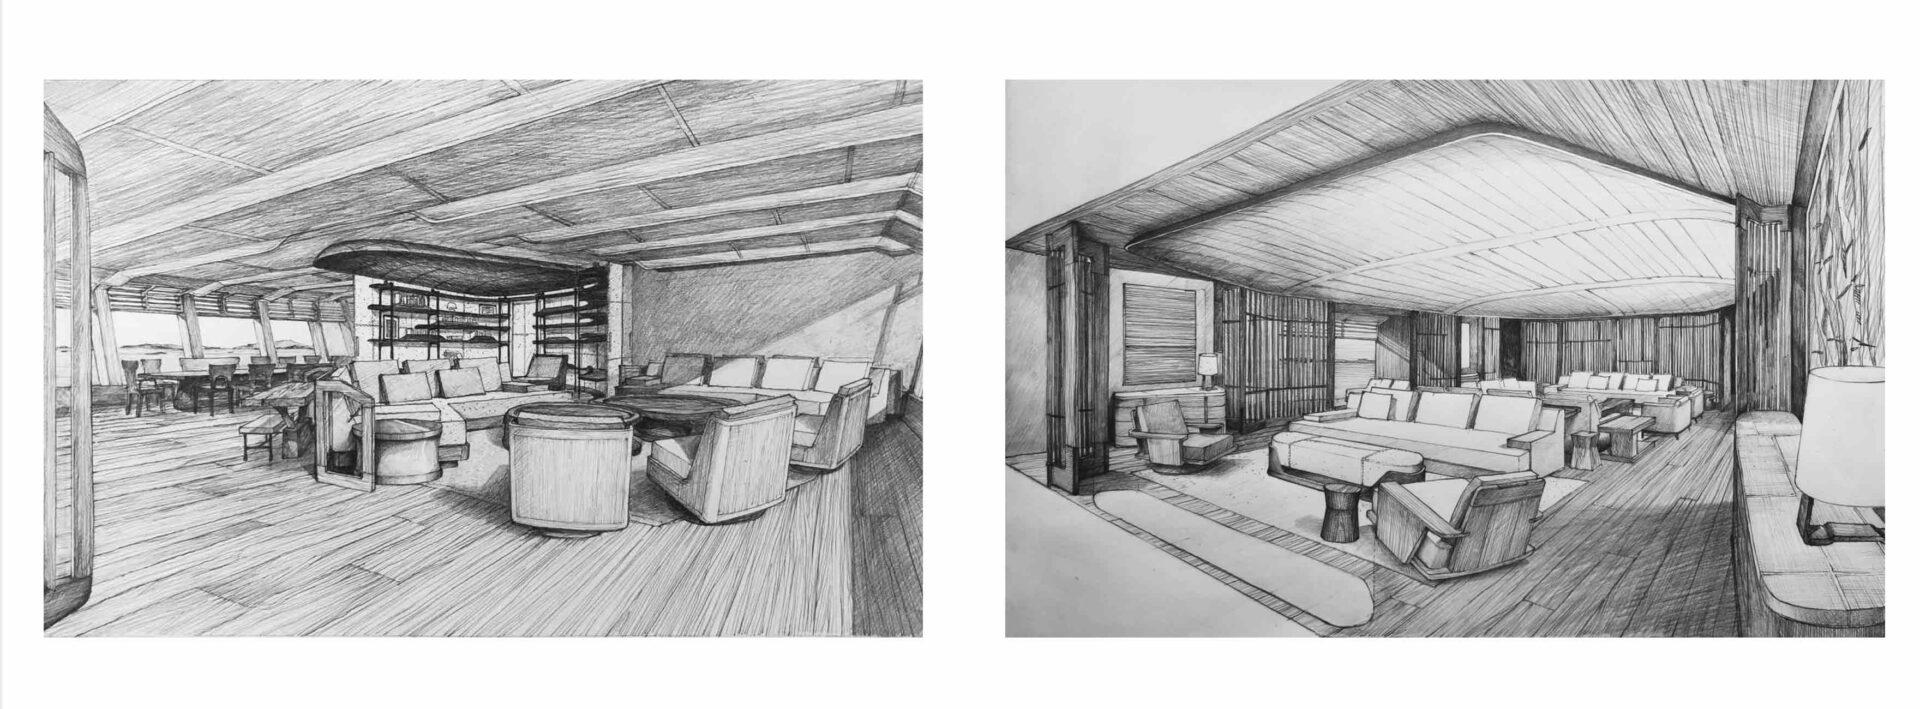 megayacht interior design sketches